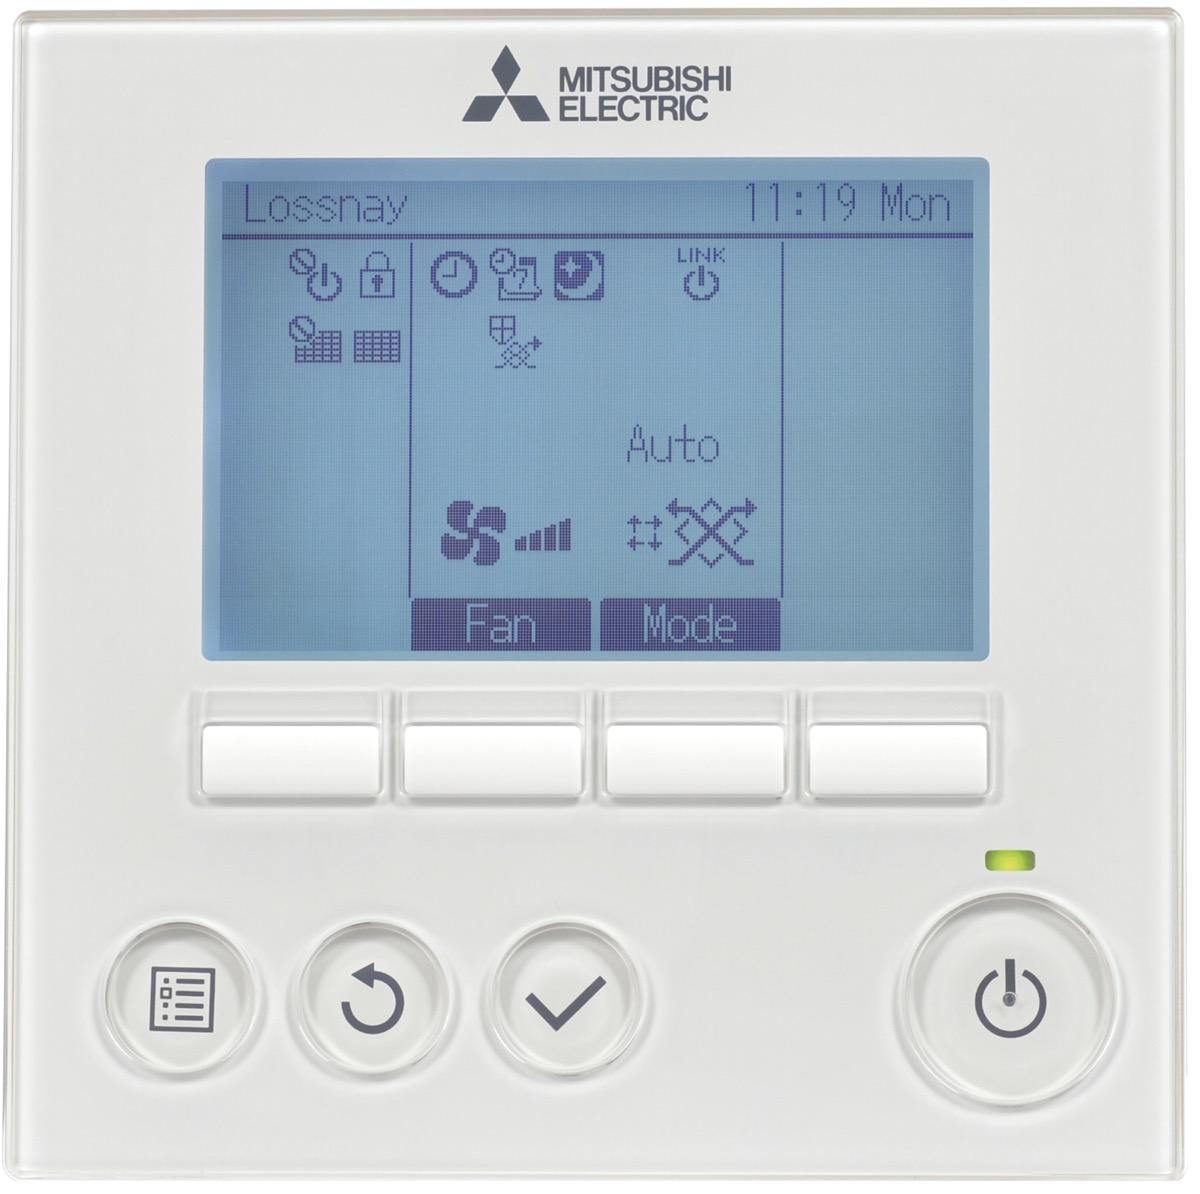 Mitsubishi Electric Air Conditioning Controls